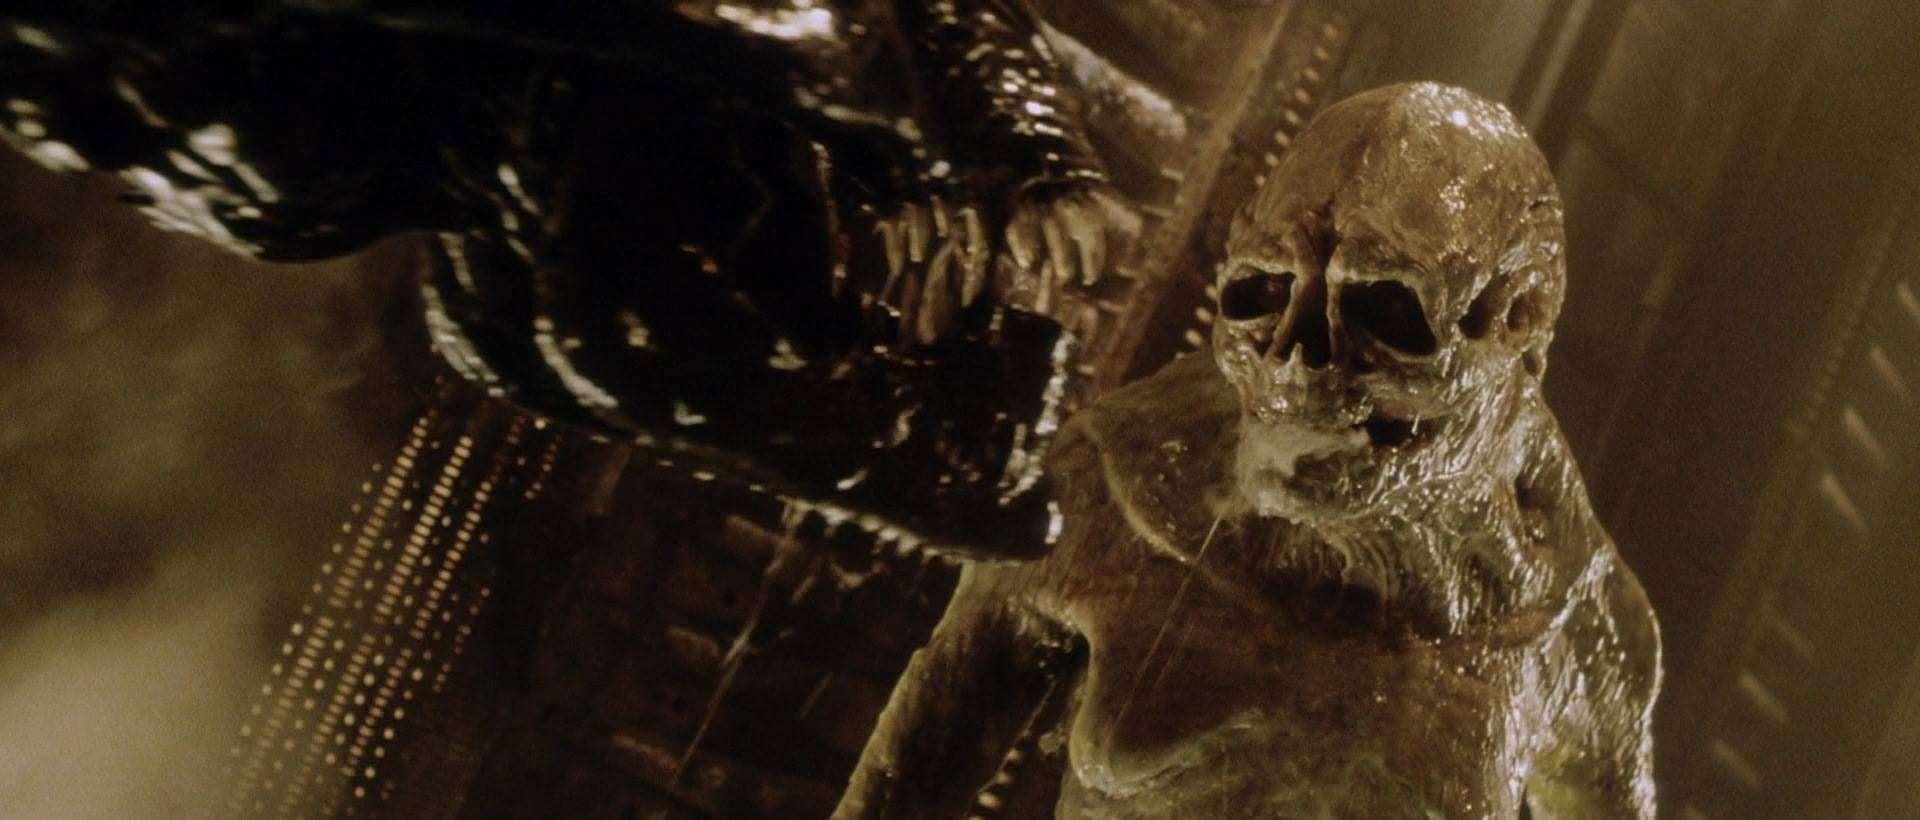 alien resurrection hybrid baby sigourney weaver